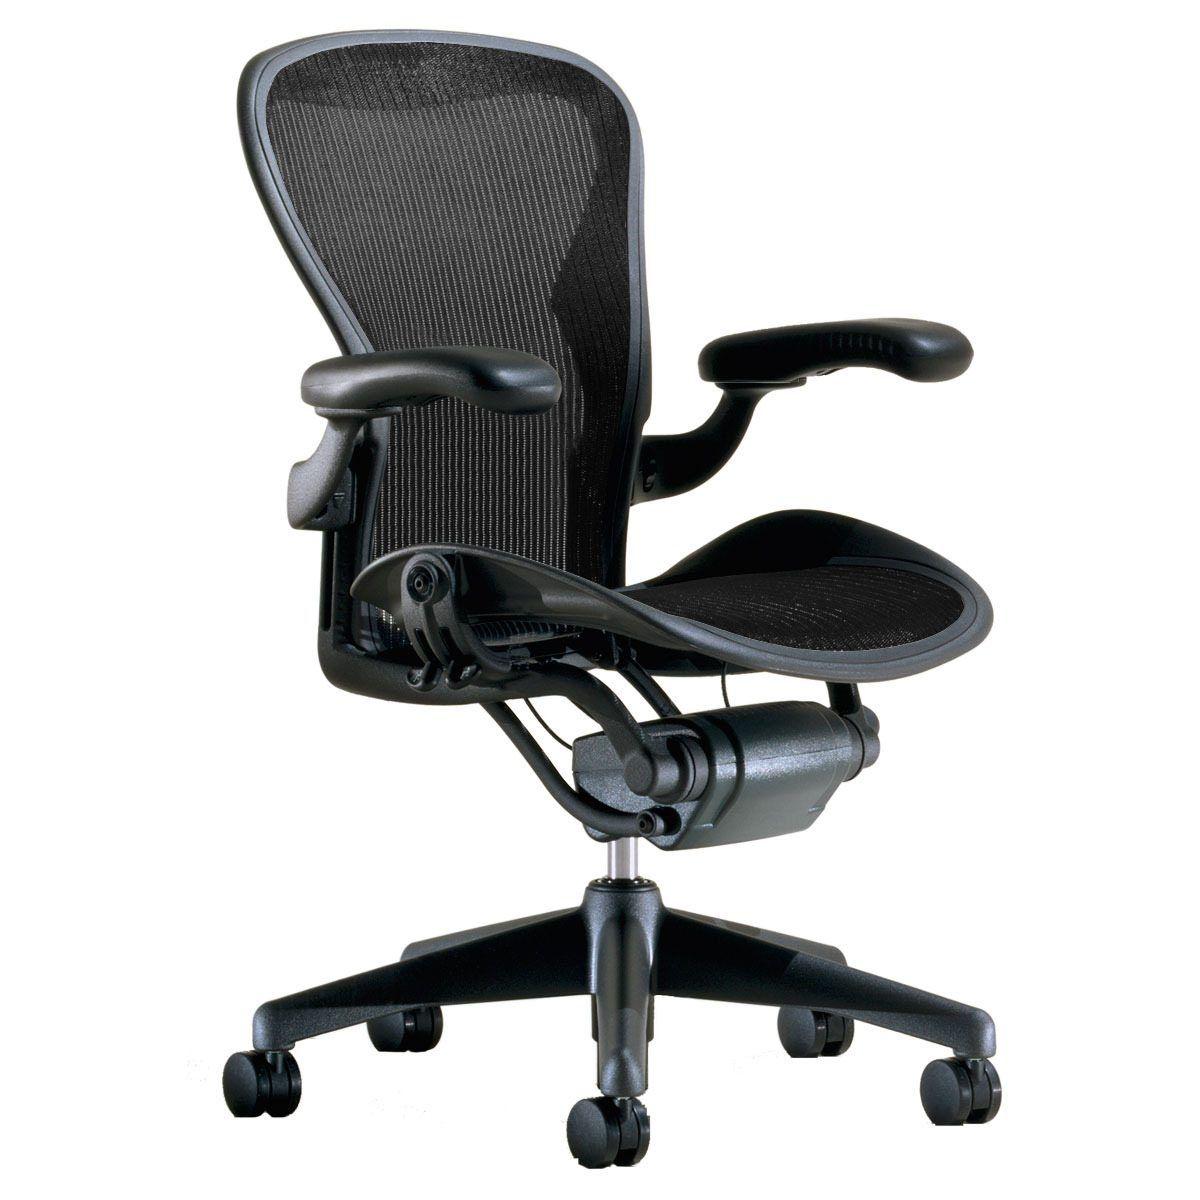 ergonomics desk chair swing penang best ergonomic and http devintavern com pinterest